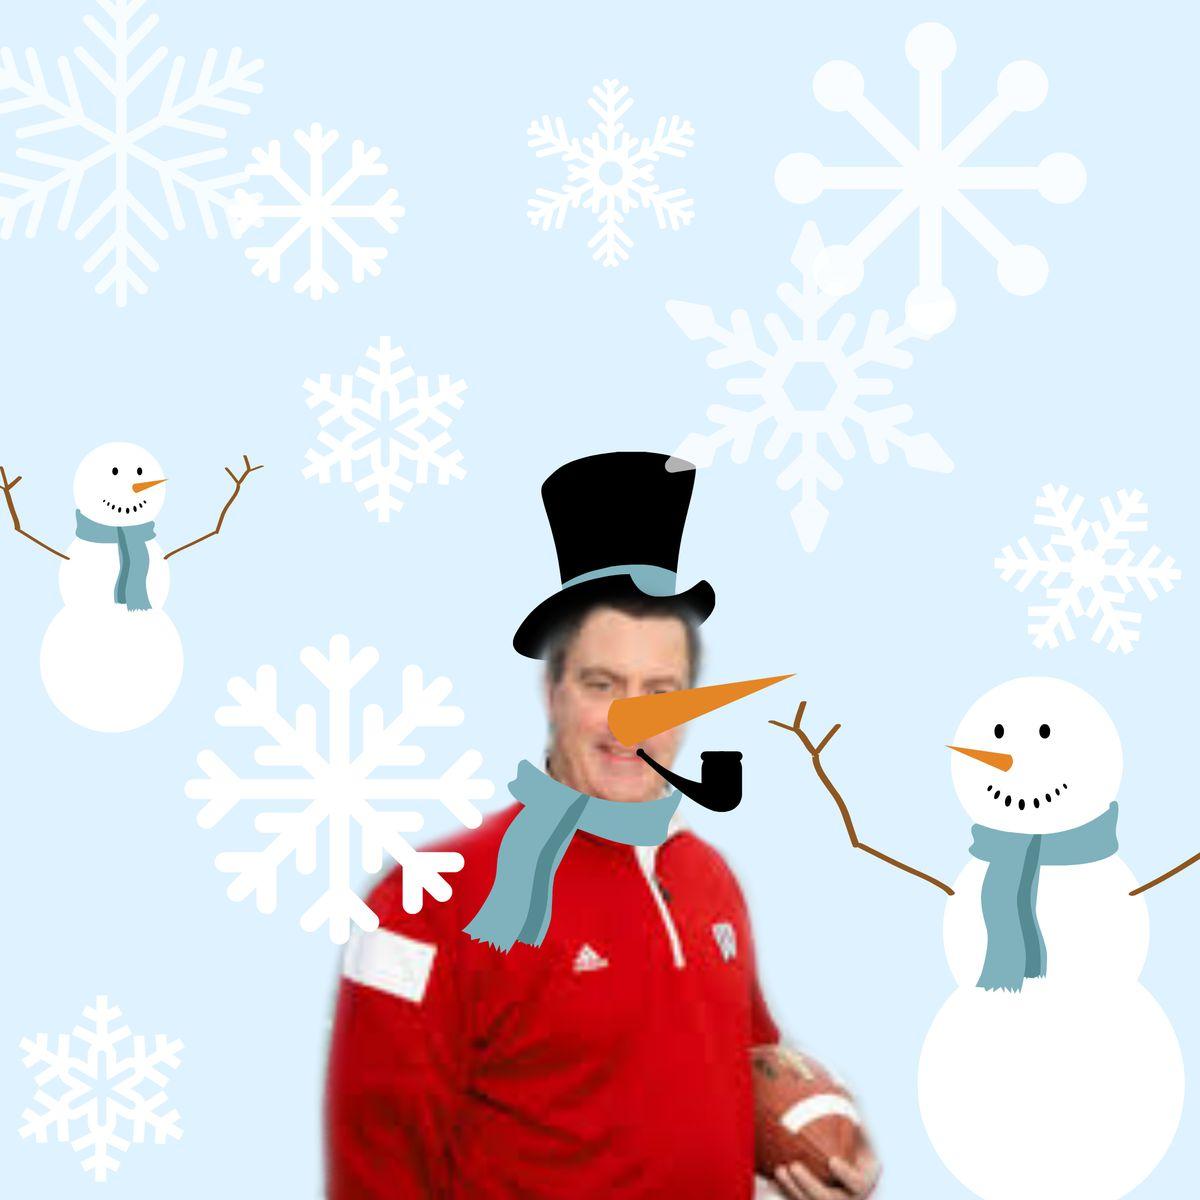 Snowman Chyrst